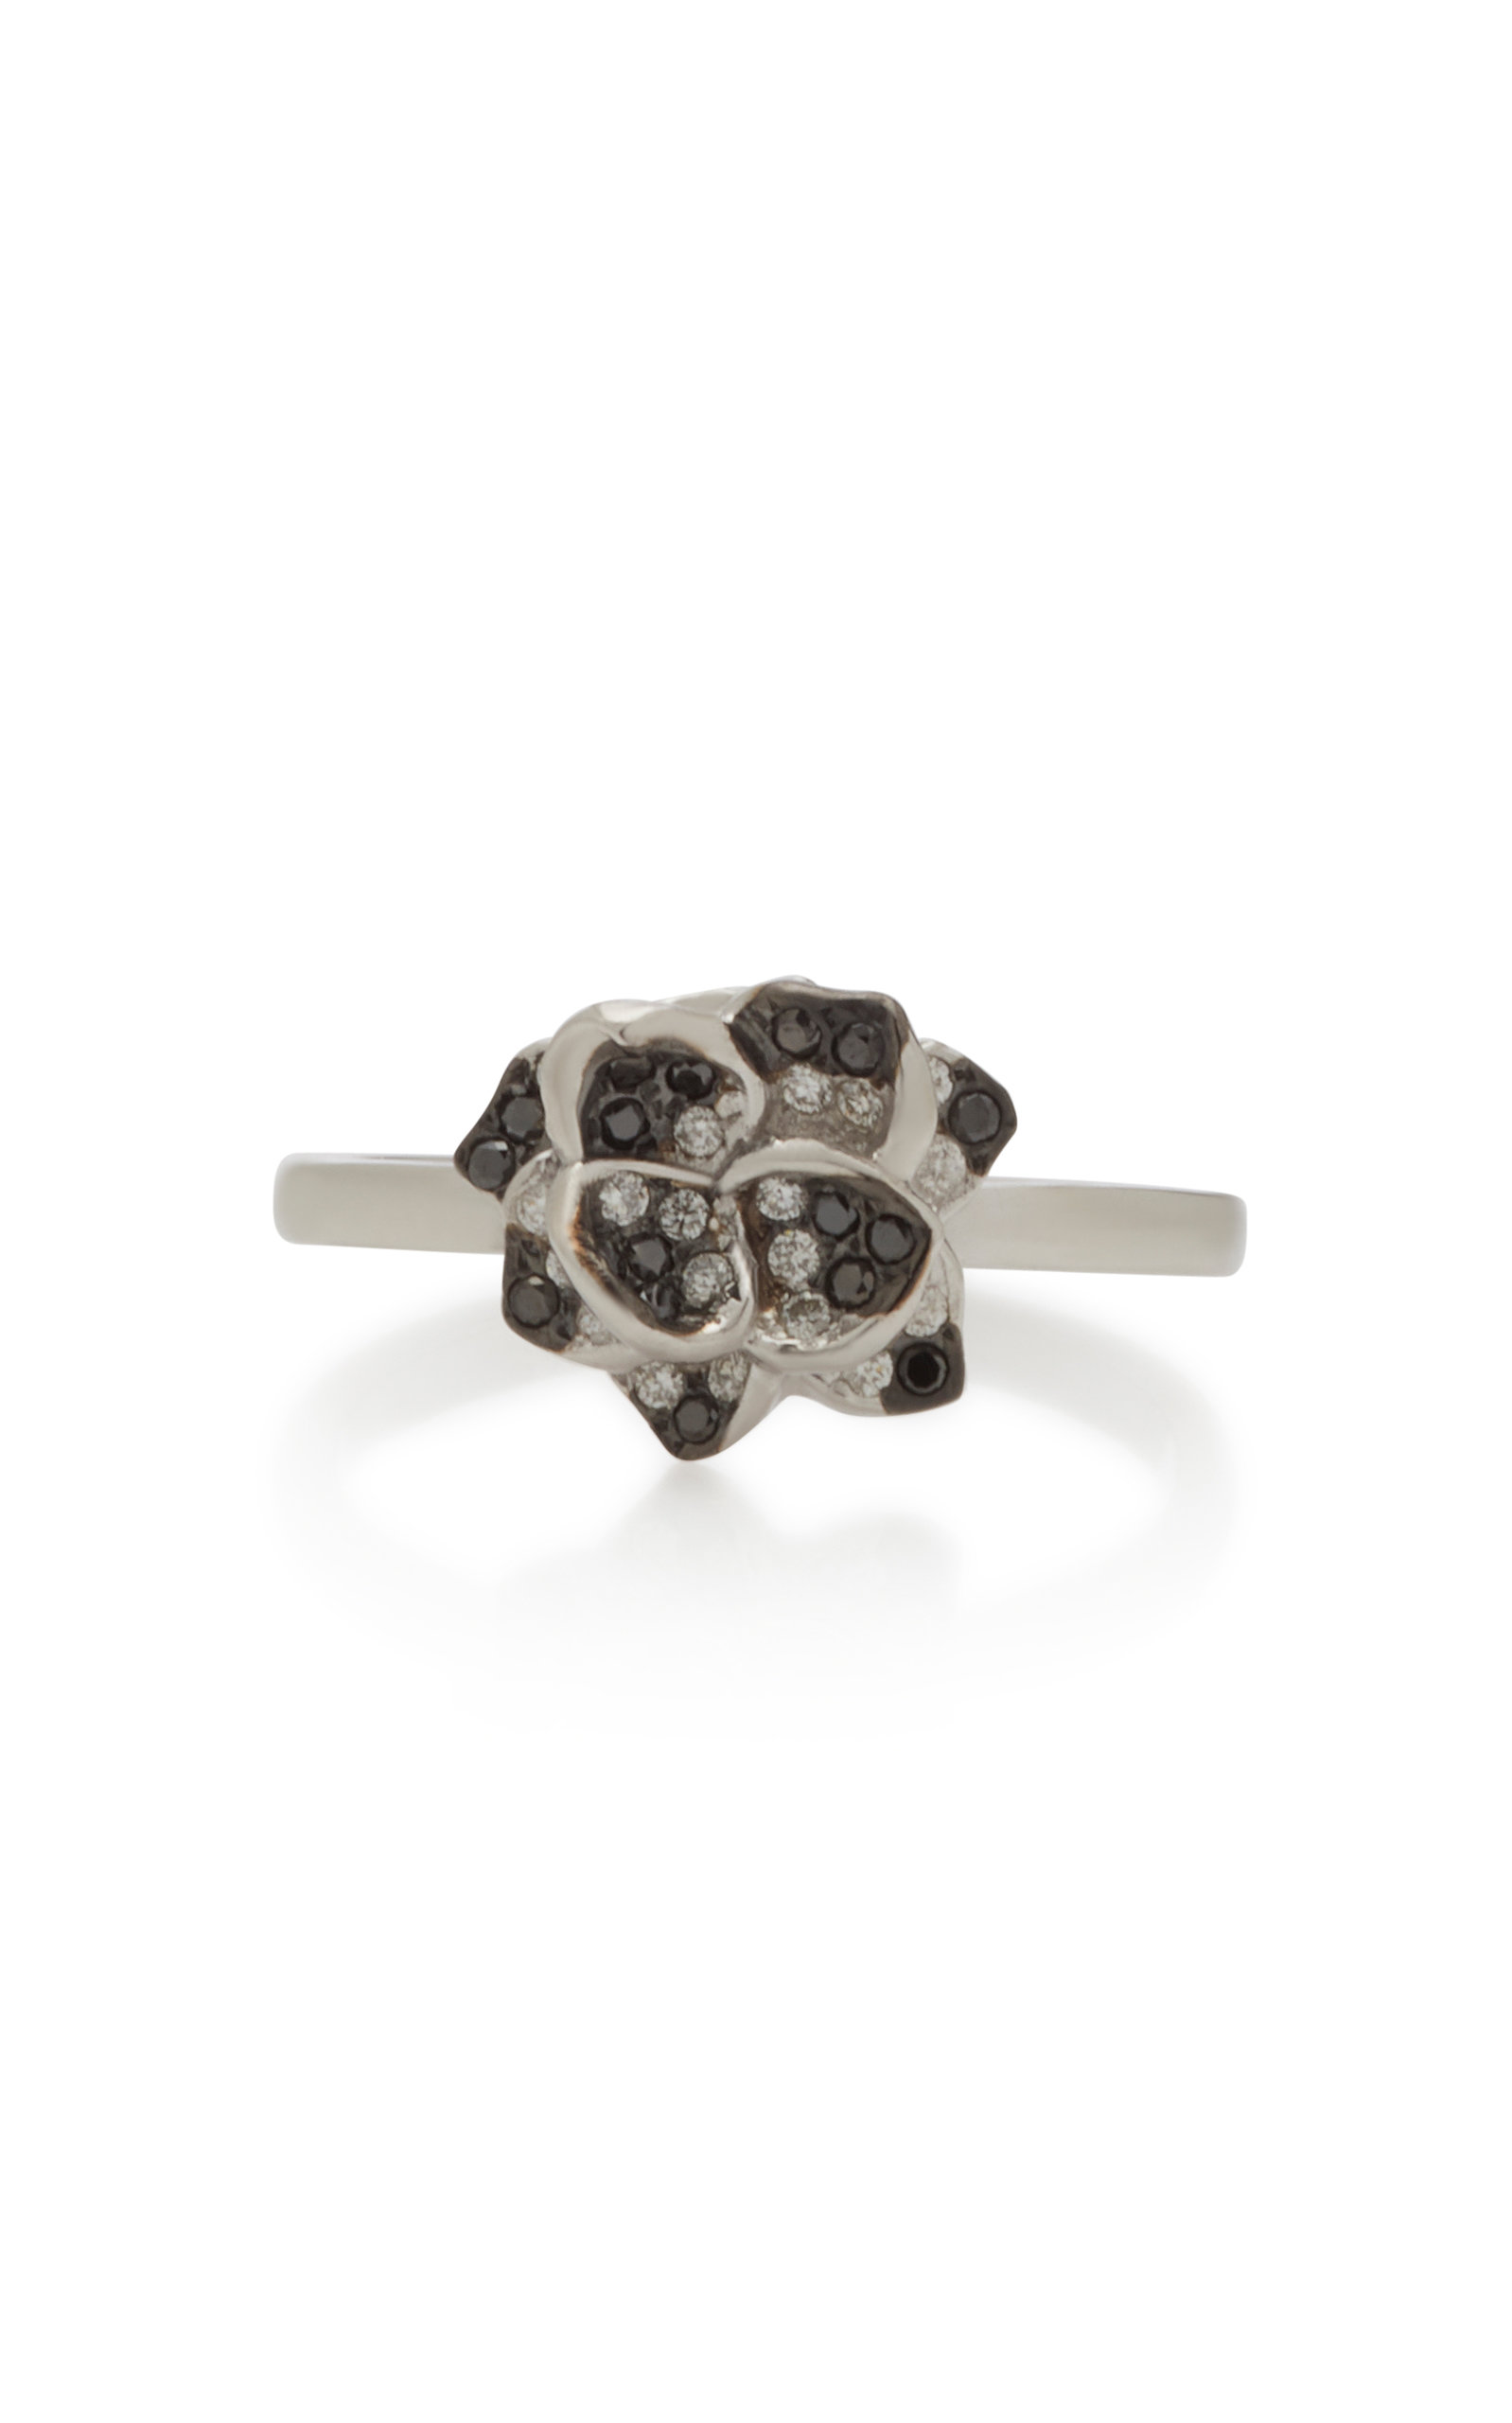 Women's 18K White Gold and Black Diamond Ring